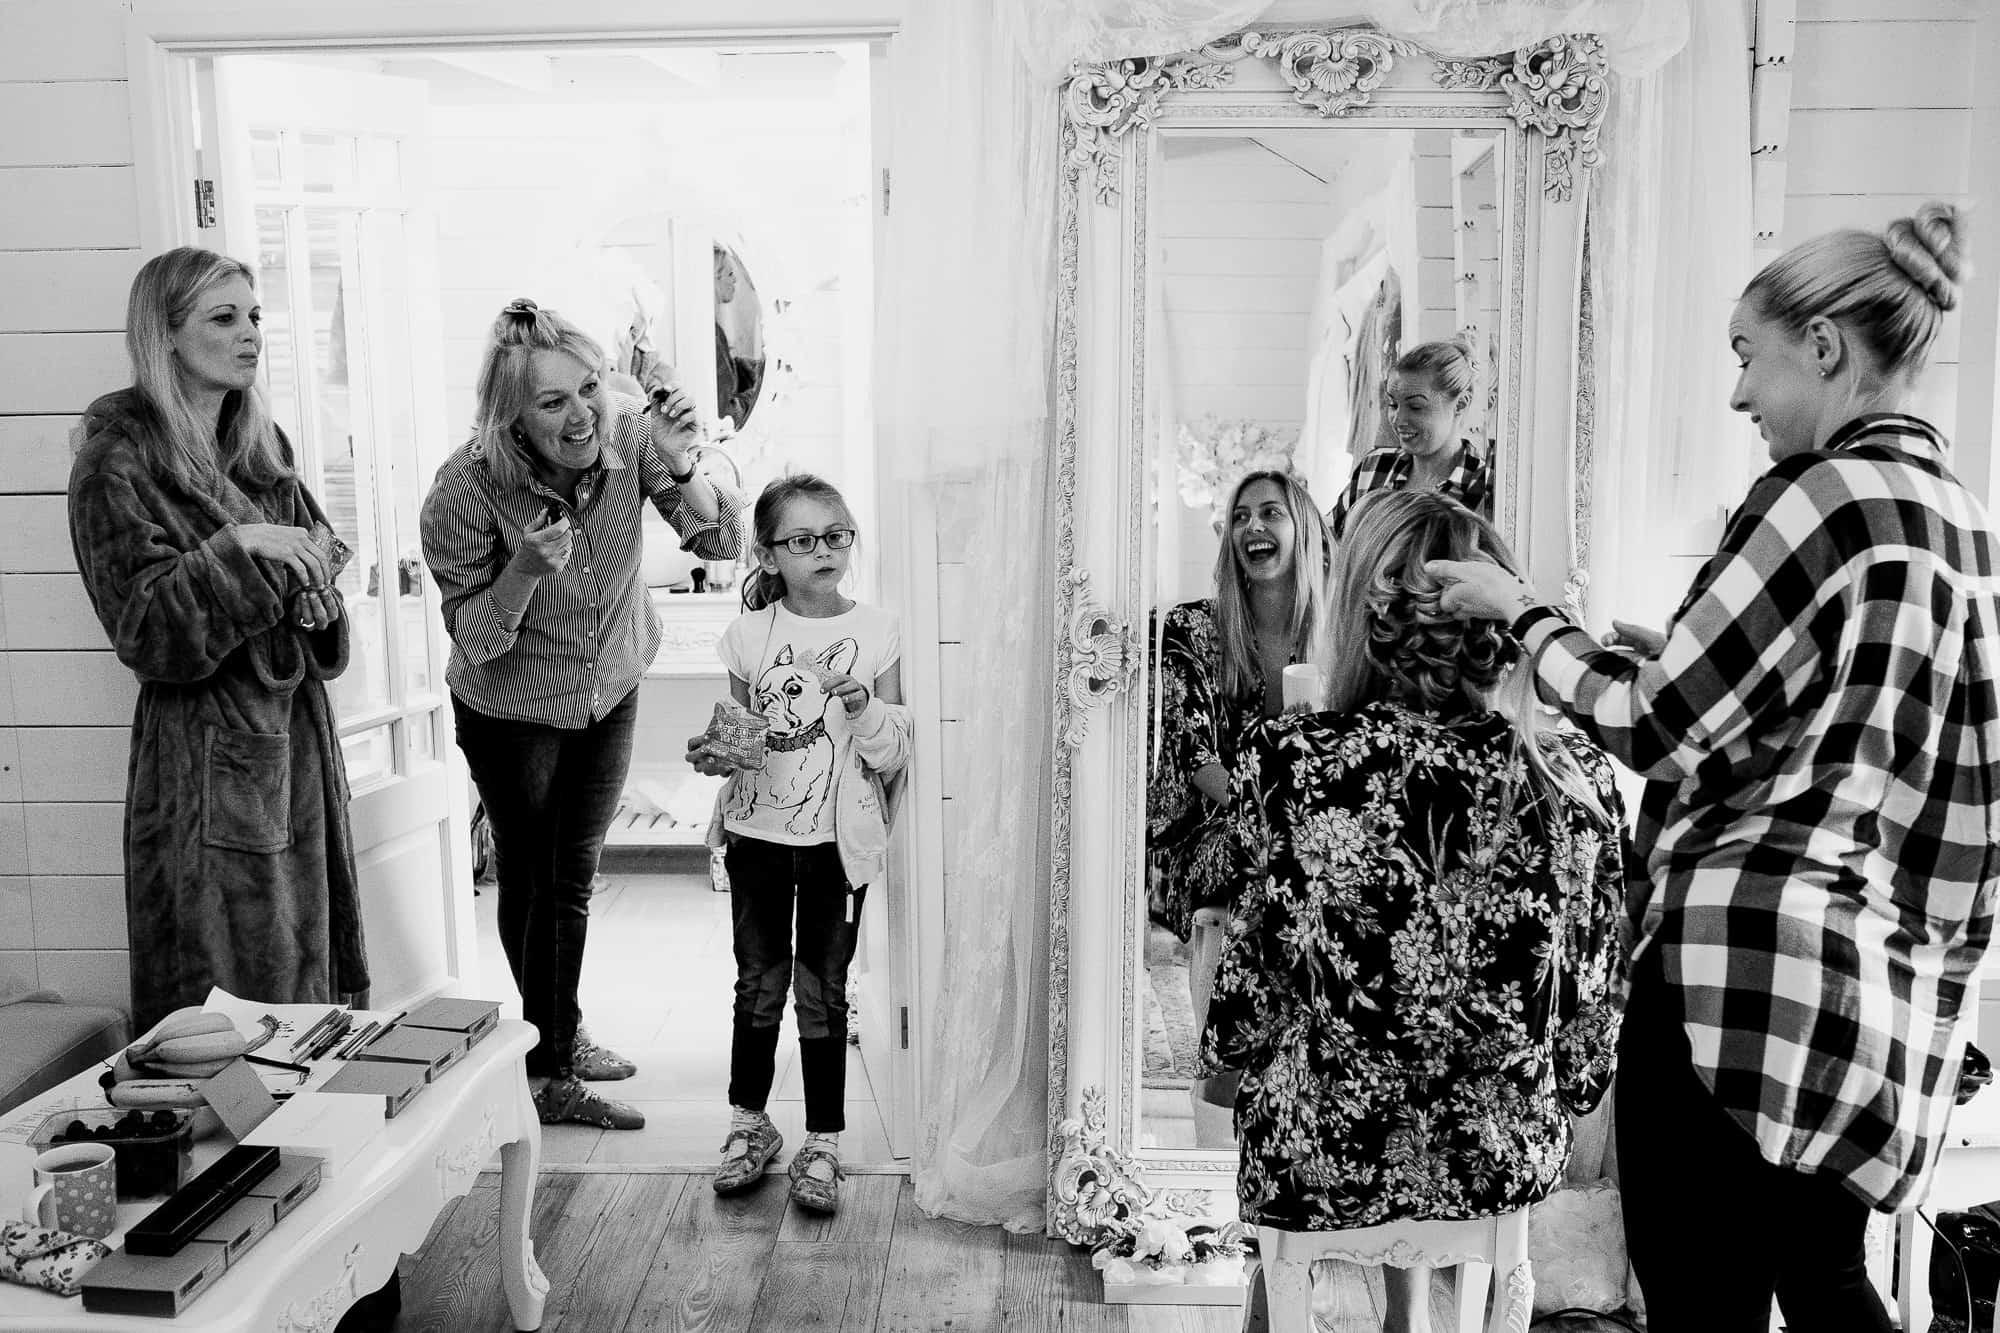 marleybrook-house-wedding-photography-matt-tyler-0001